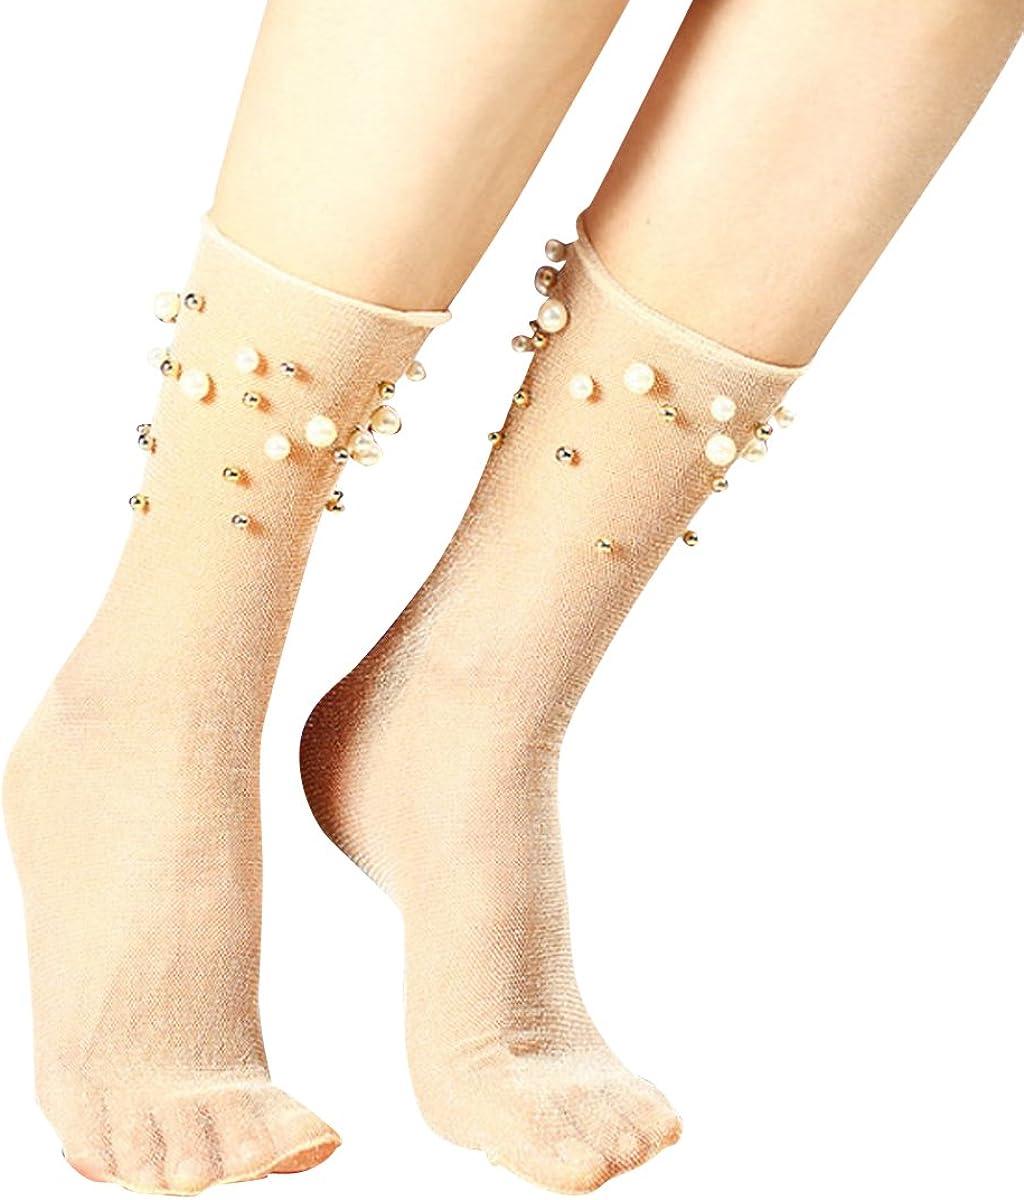 Socks Women Soft Comfy Cotton Elastic Mesh Transparent NetSheer Ankle sock